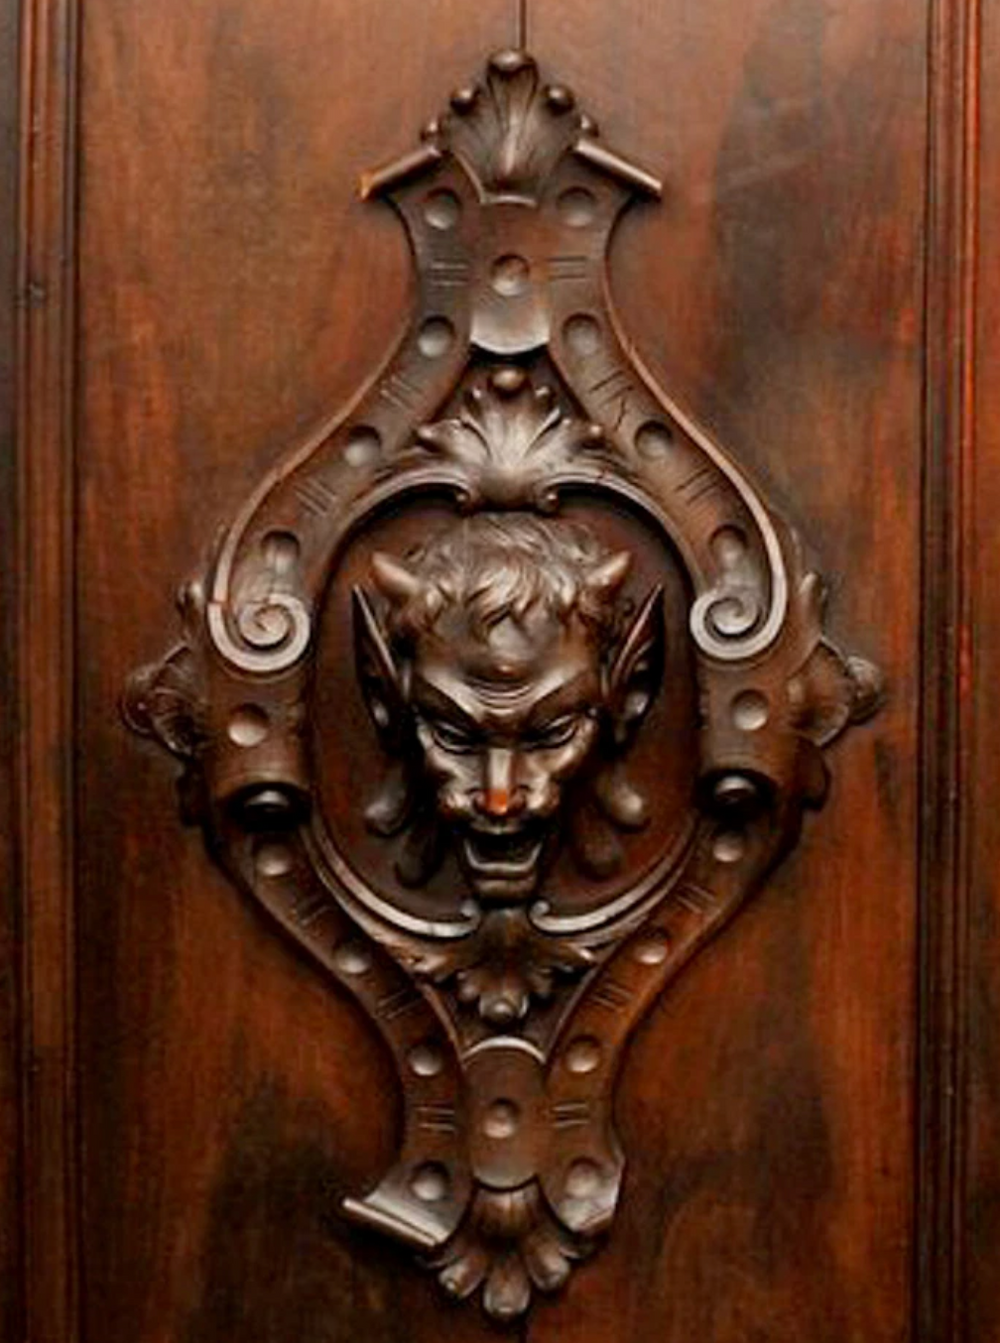 A close-up of the ornate design